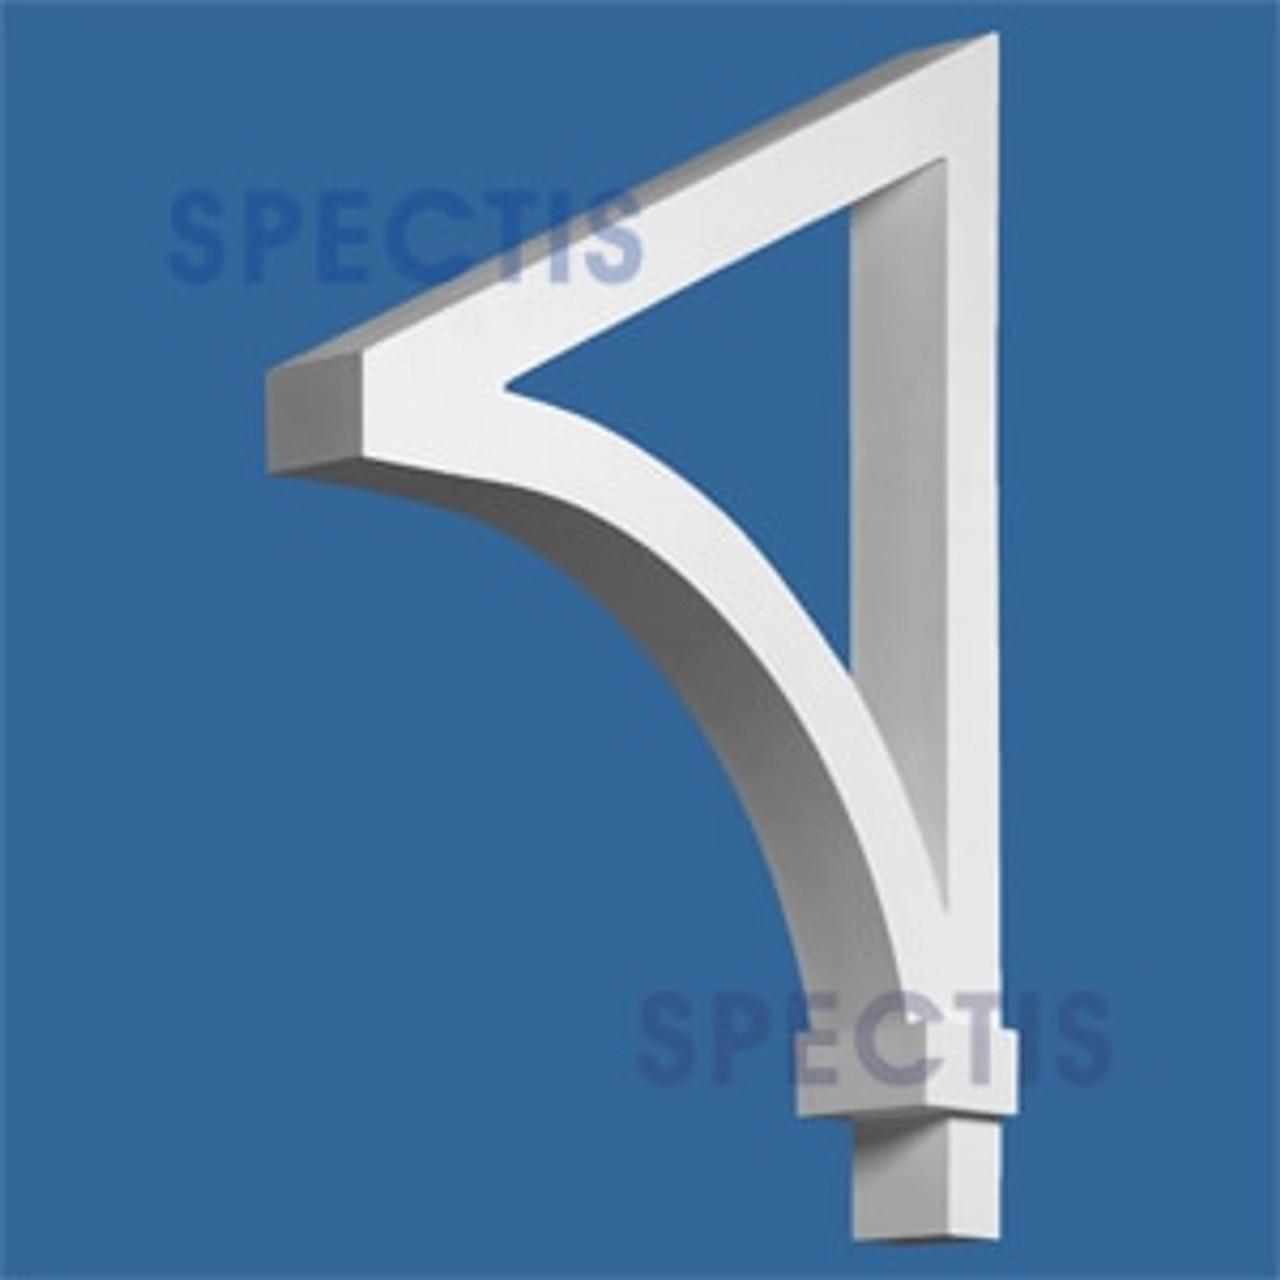 "BL2607 Corbel Block or Eave Bracket 4""W x 29""H x 22"" P"